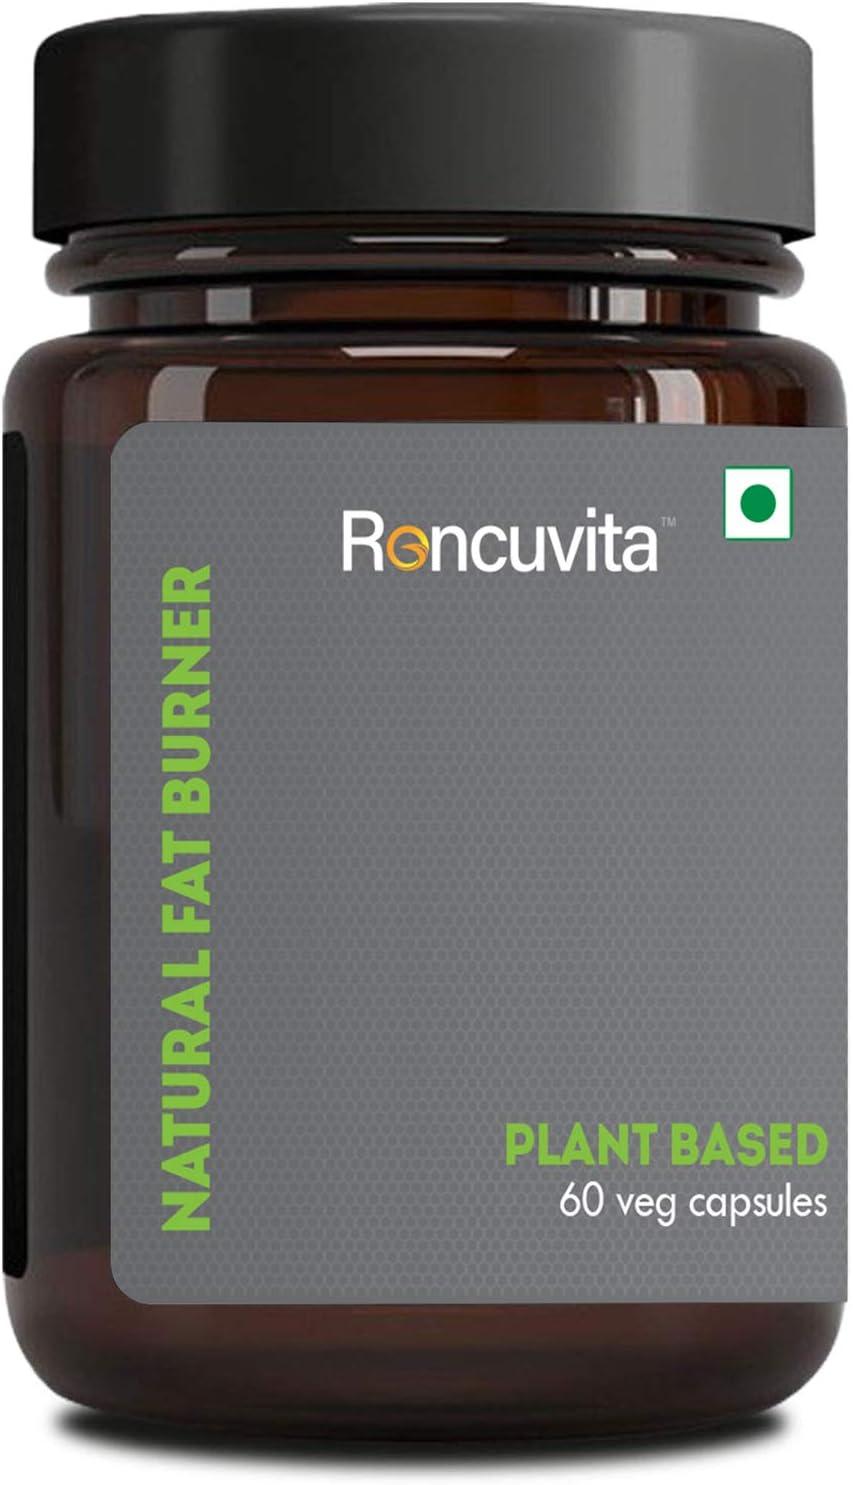 RONCUVITA the Best Fat Burner Supplements